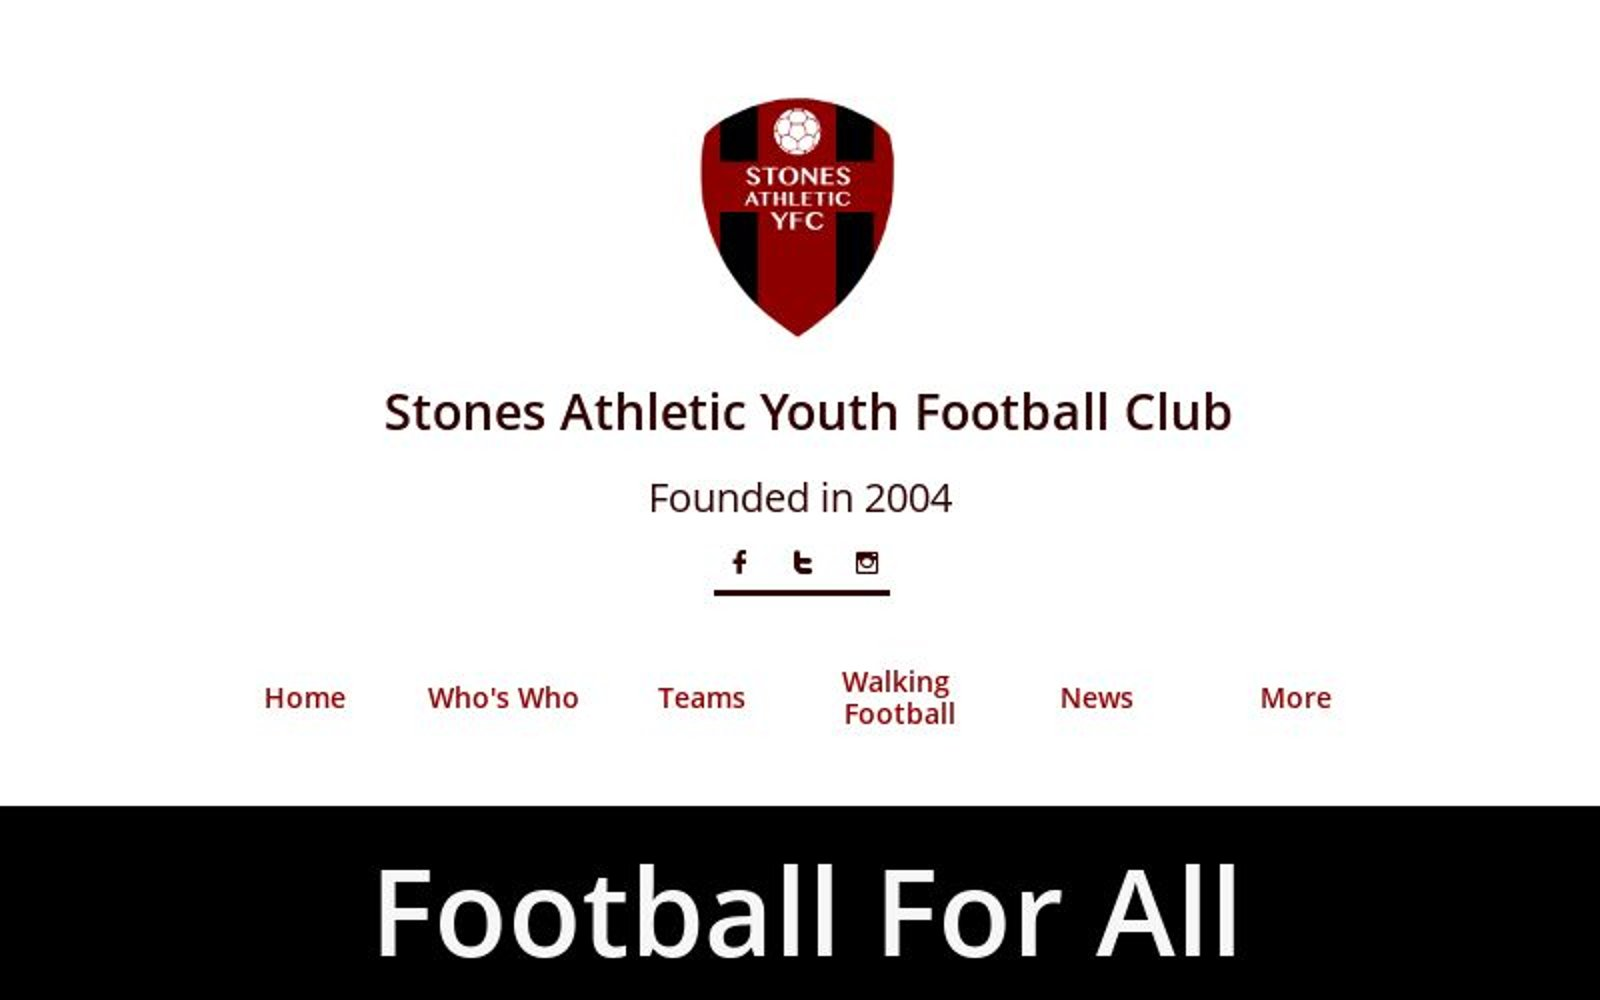 stonesathleticyfc